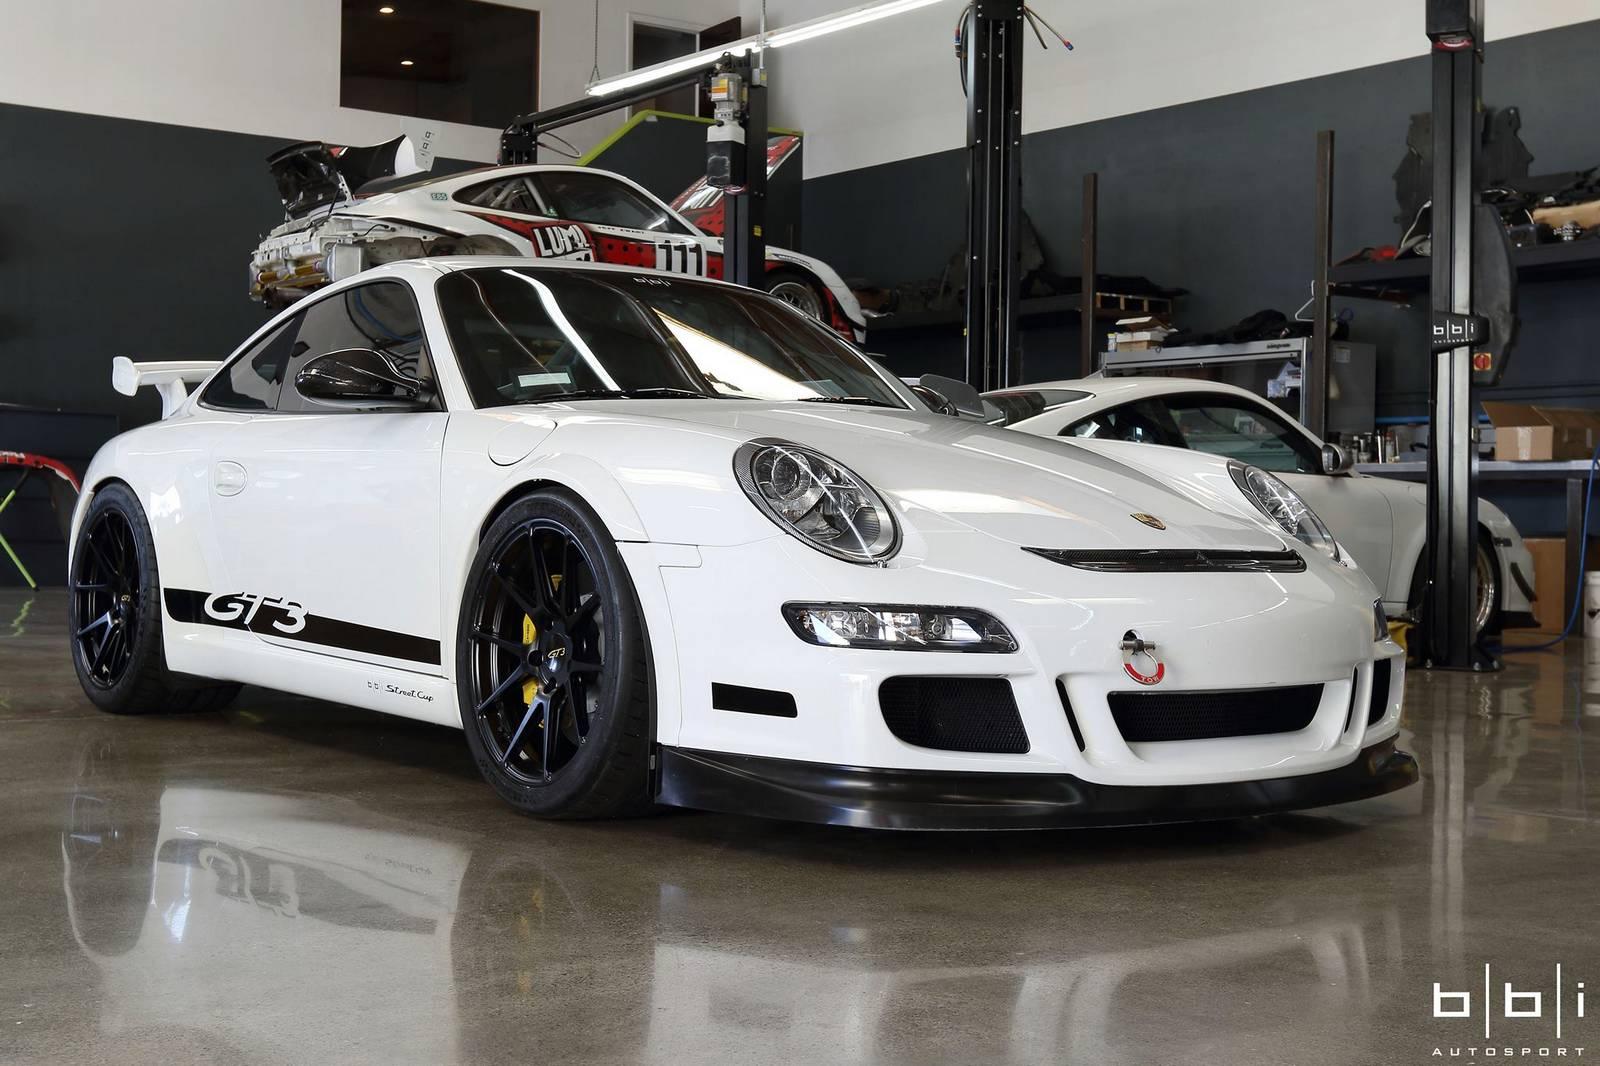 Porsche 911 Gt3 Project Bull Dog By Bbi Autosport Gtspirit